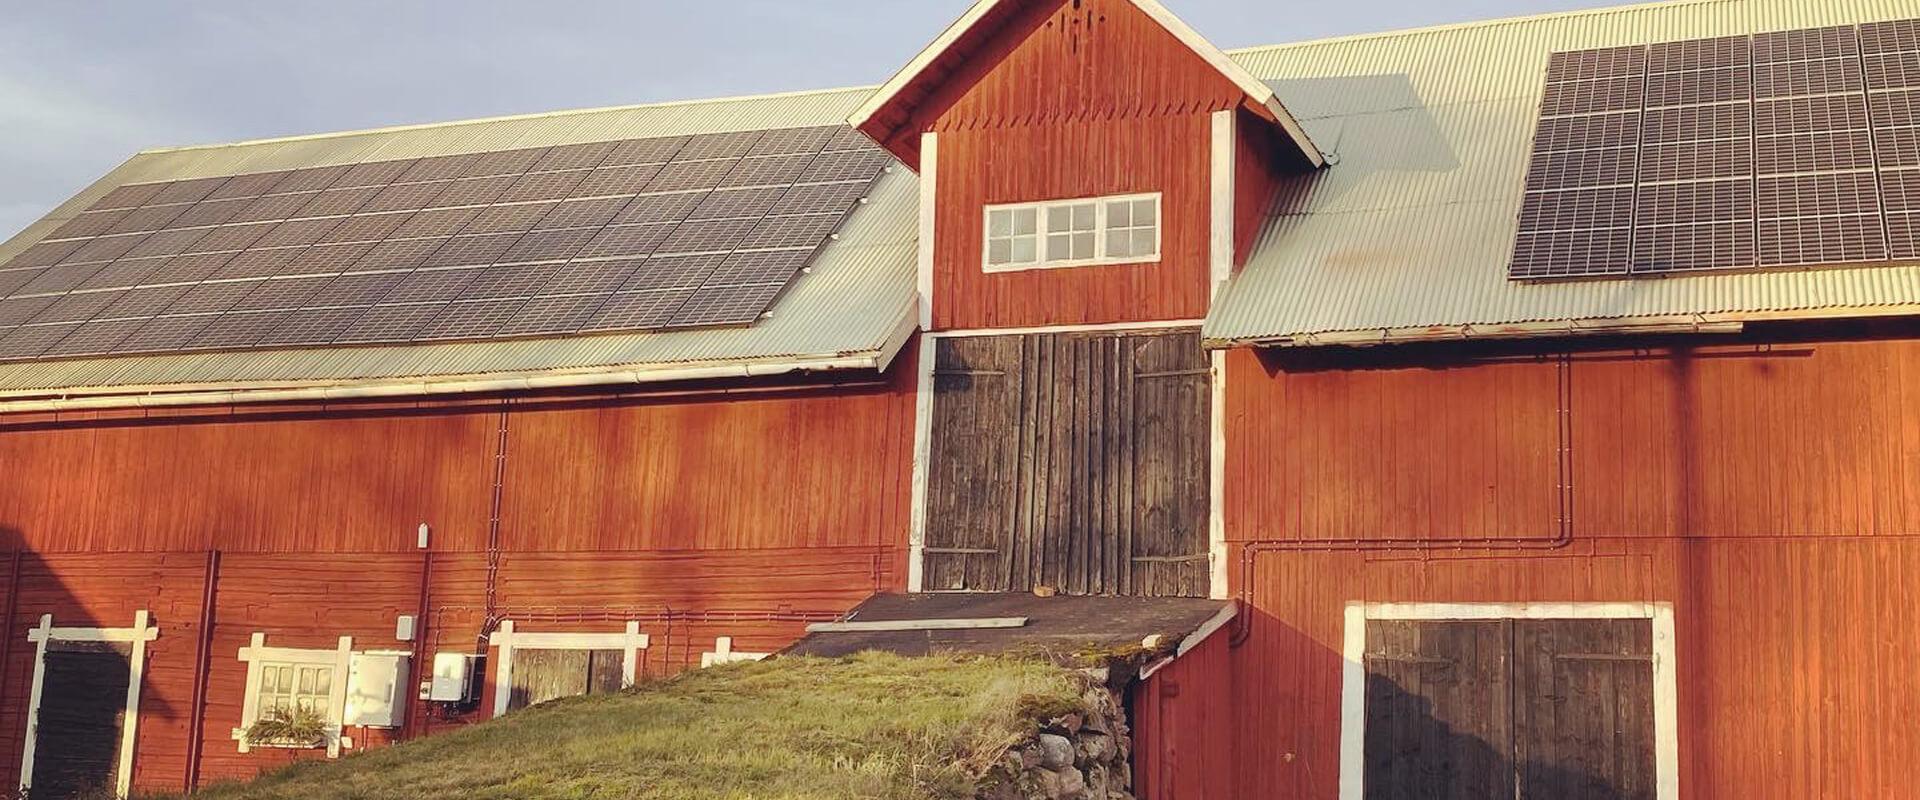 Solpaneler hos ett lantbruk installerat av Wettersol i Jönköping